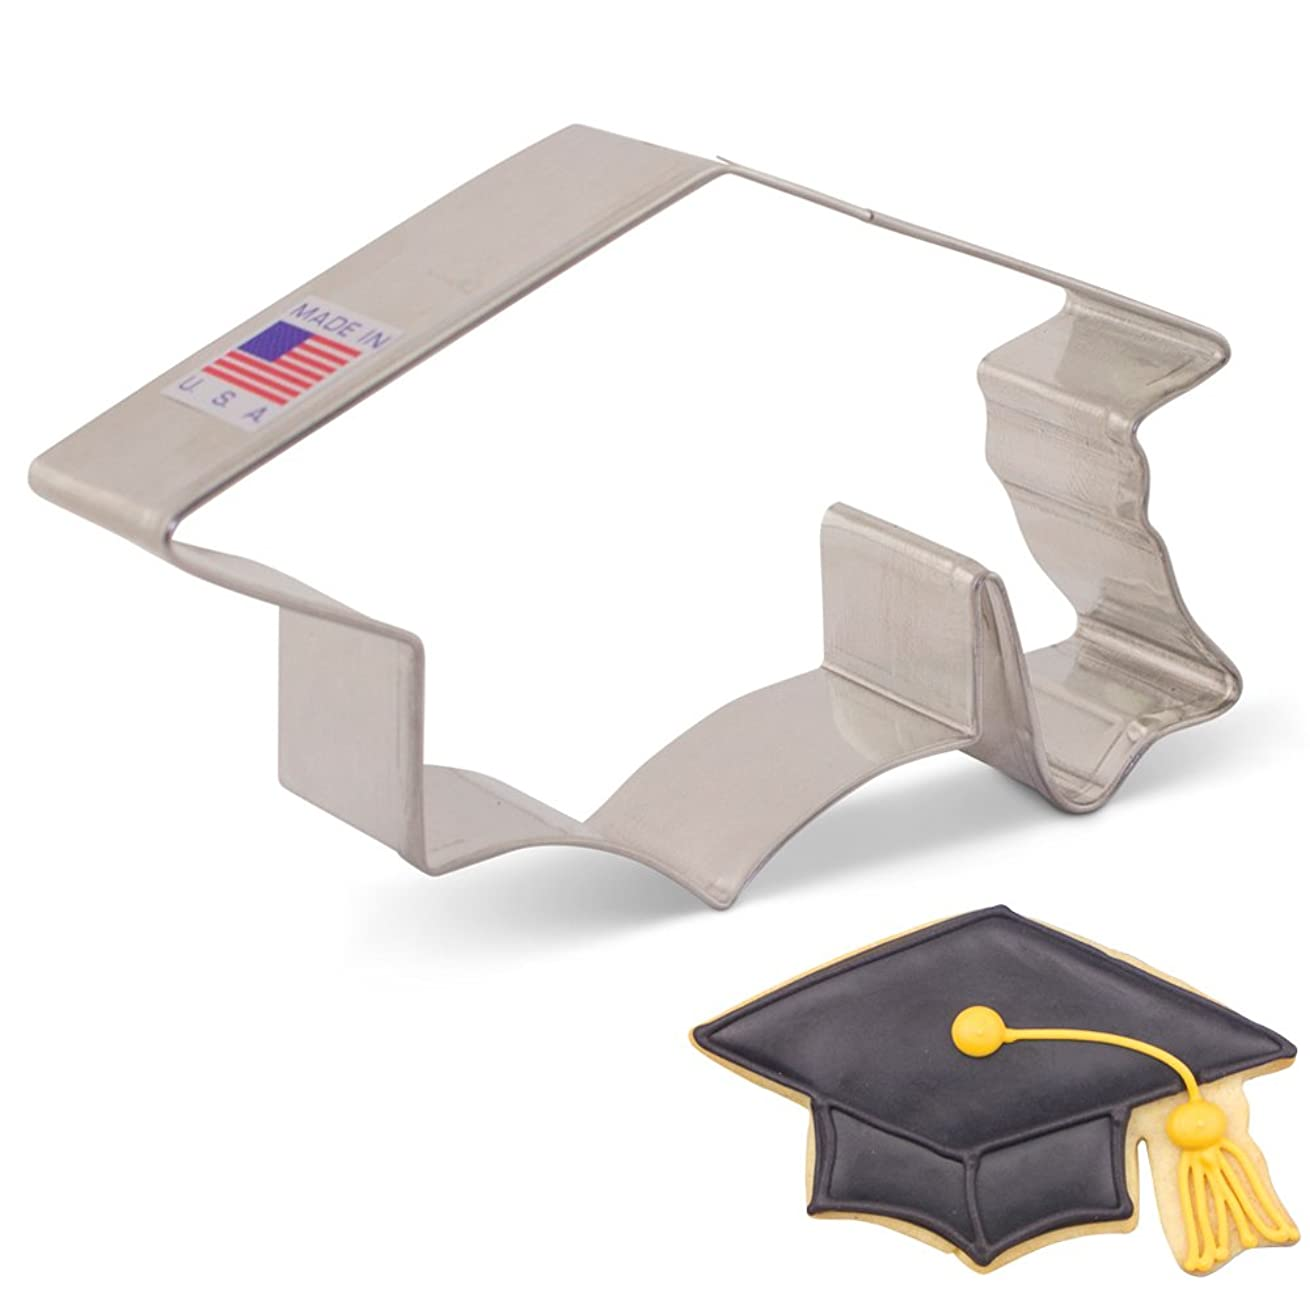 Graduation Cap/Hat/Mortar Board Cookie Cutter - 4.5 Inch - Ann Clark - US Tin Plated Steel